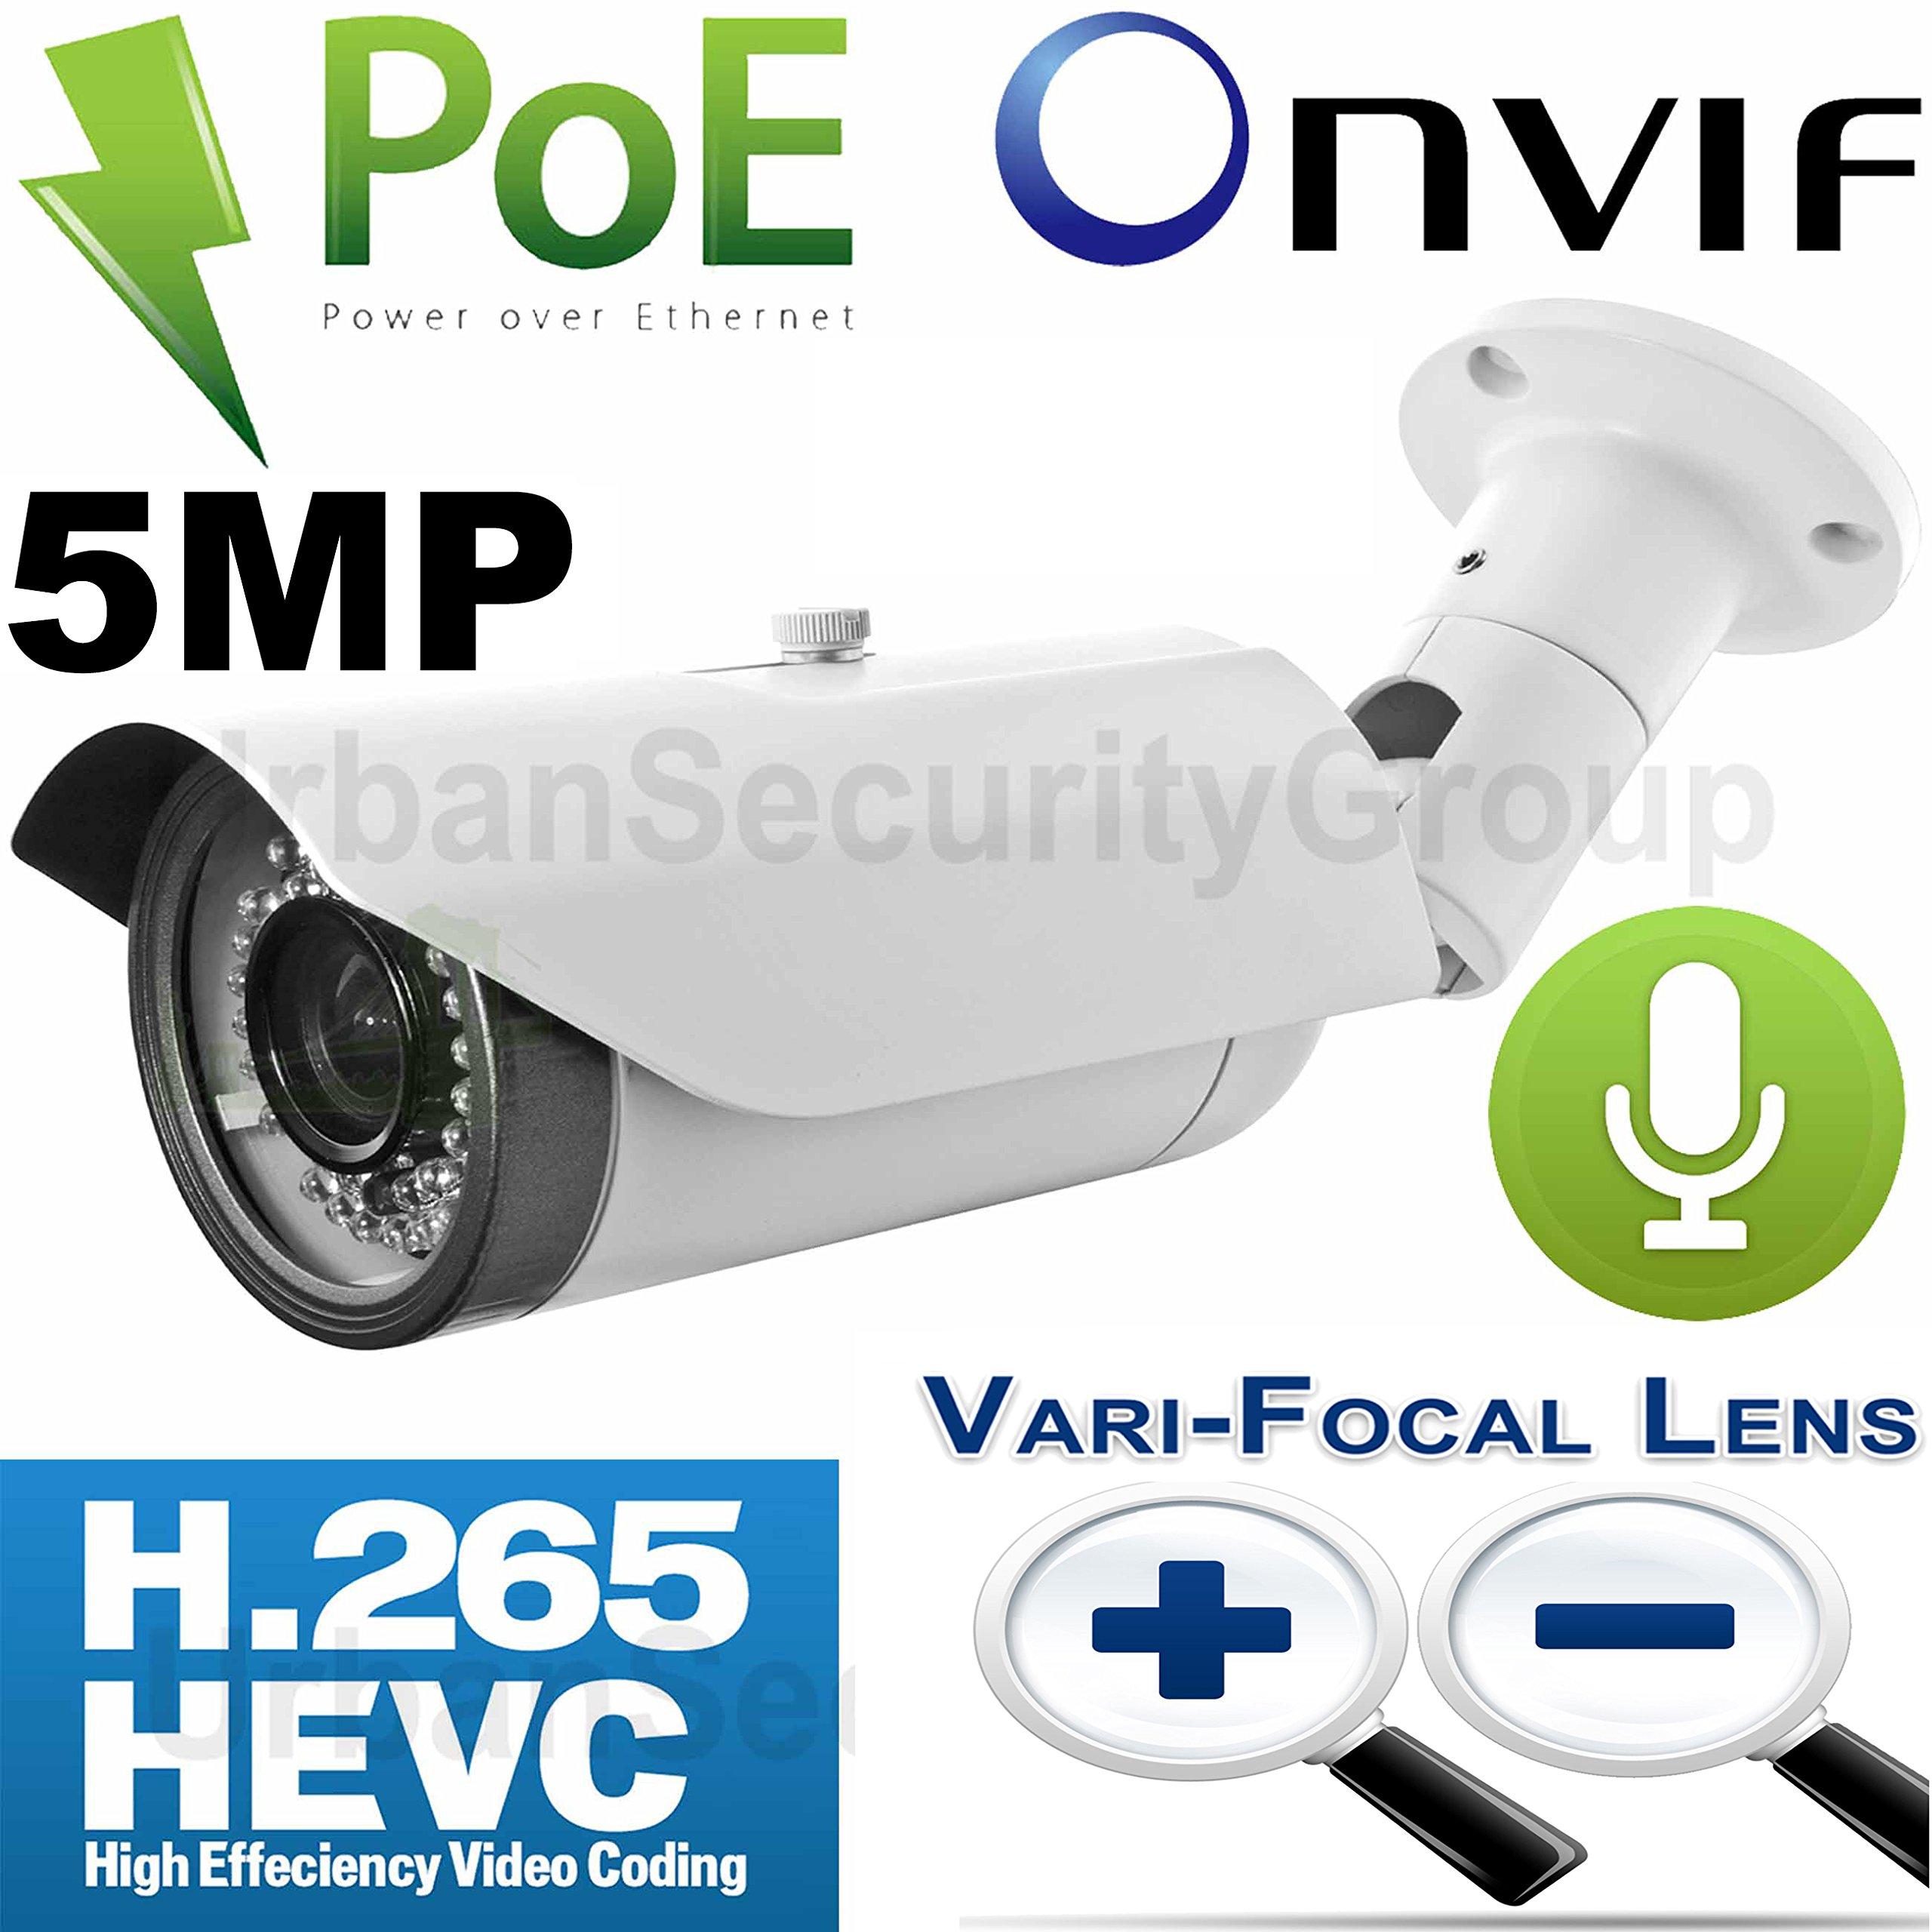 USG Business Grade 5MP @ 30FPS H.265 IP Bullet Security Camera + RCA Audio : MOTORIZED Auto-Focus 2.7-13.5mm Lens, Power Over Ethernet, 42x IR LEDs, Weatherproof, ONVIF 2.4 : Mac, Windows, Phone App